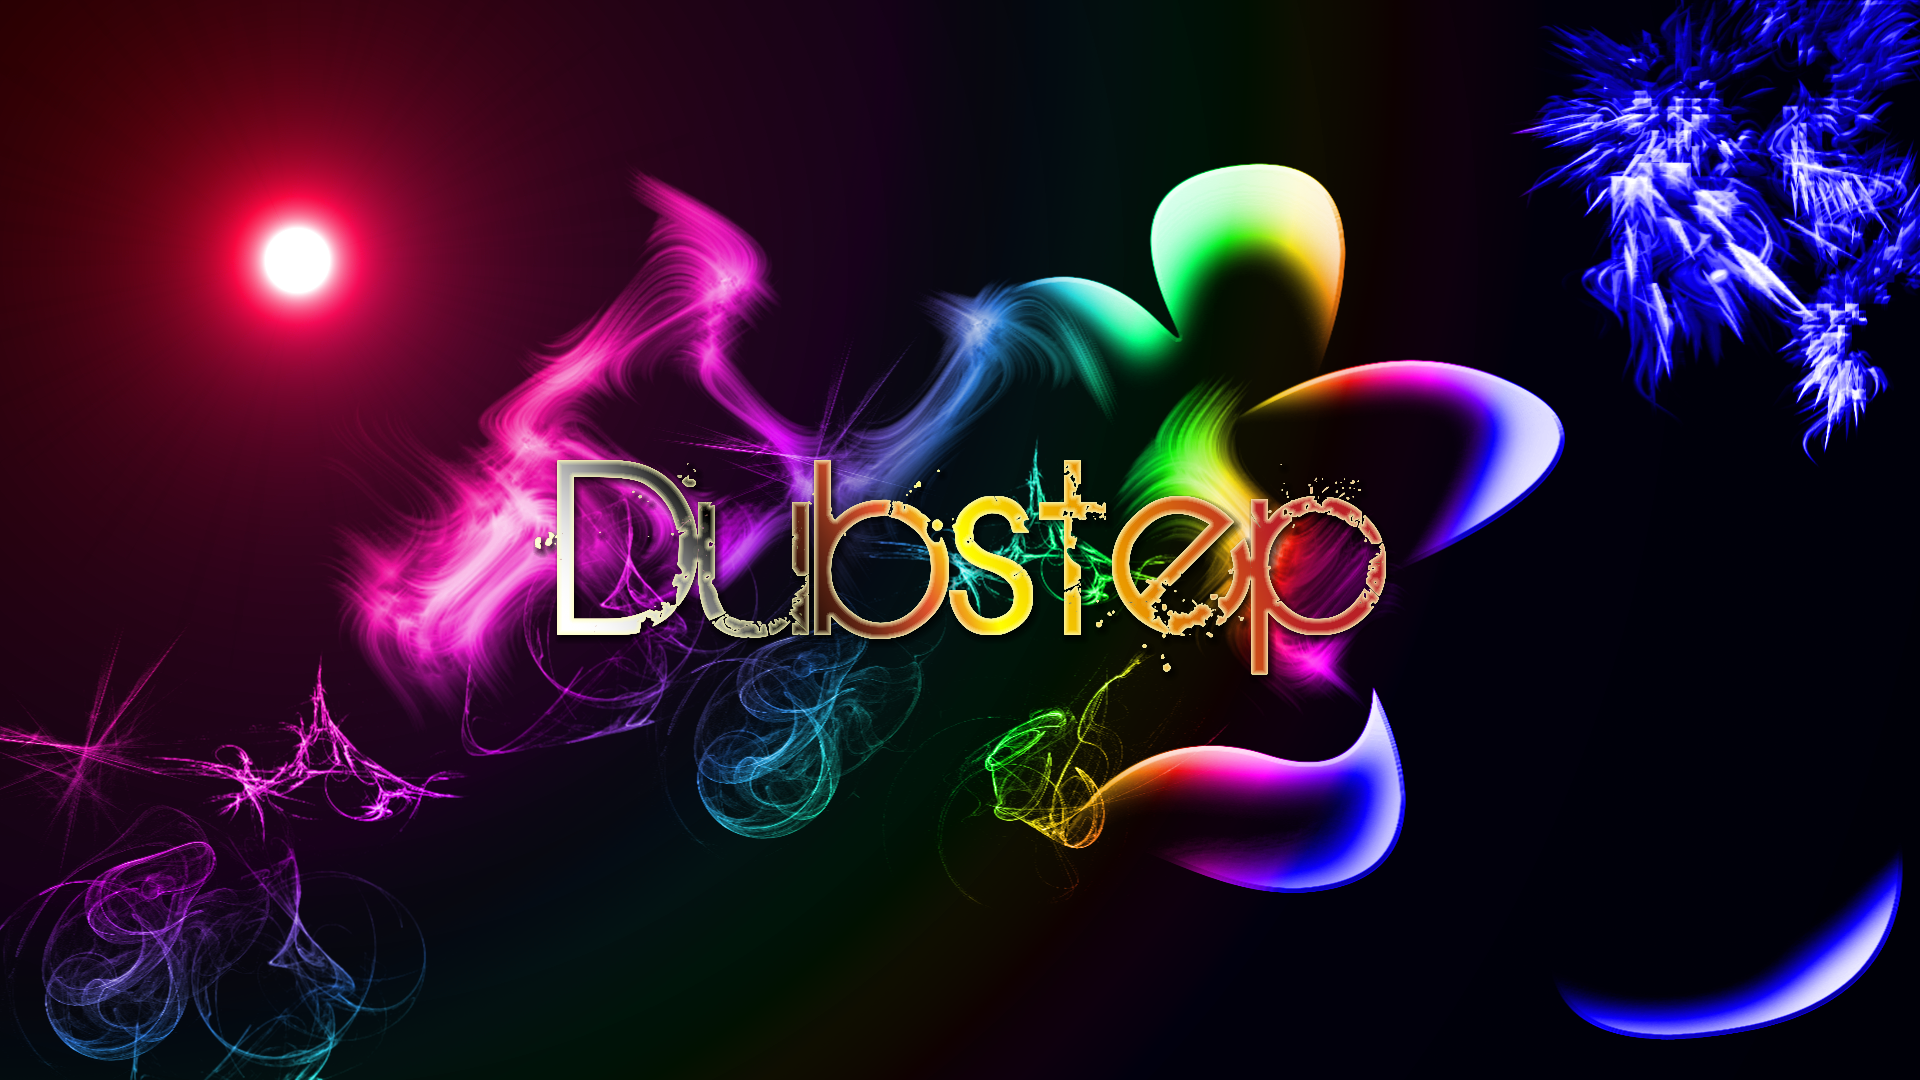 графика dubstep музыка  № 2880860 бесплатно